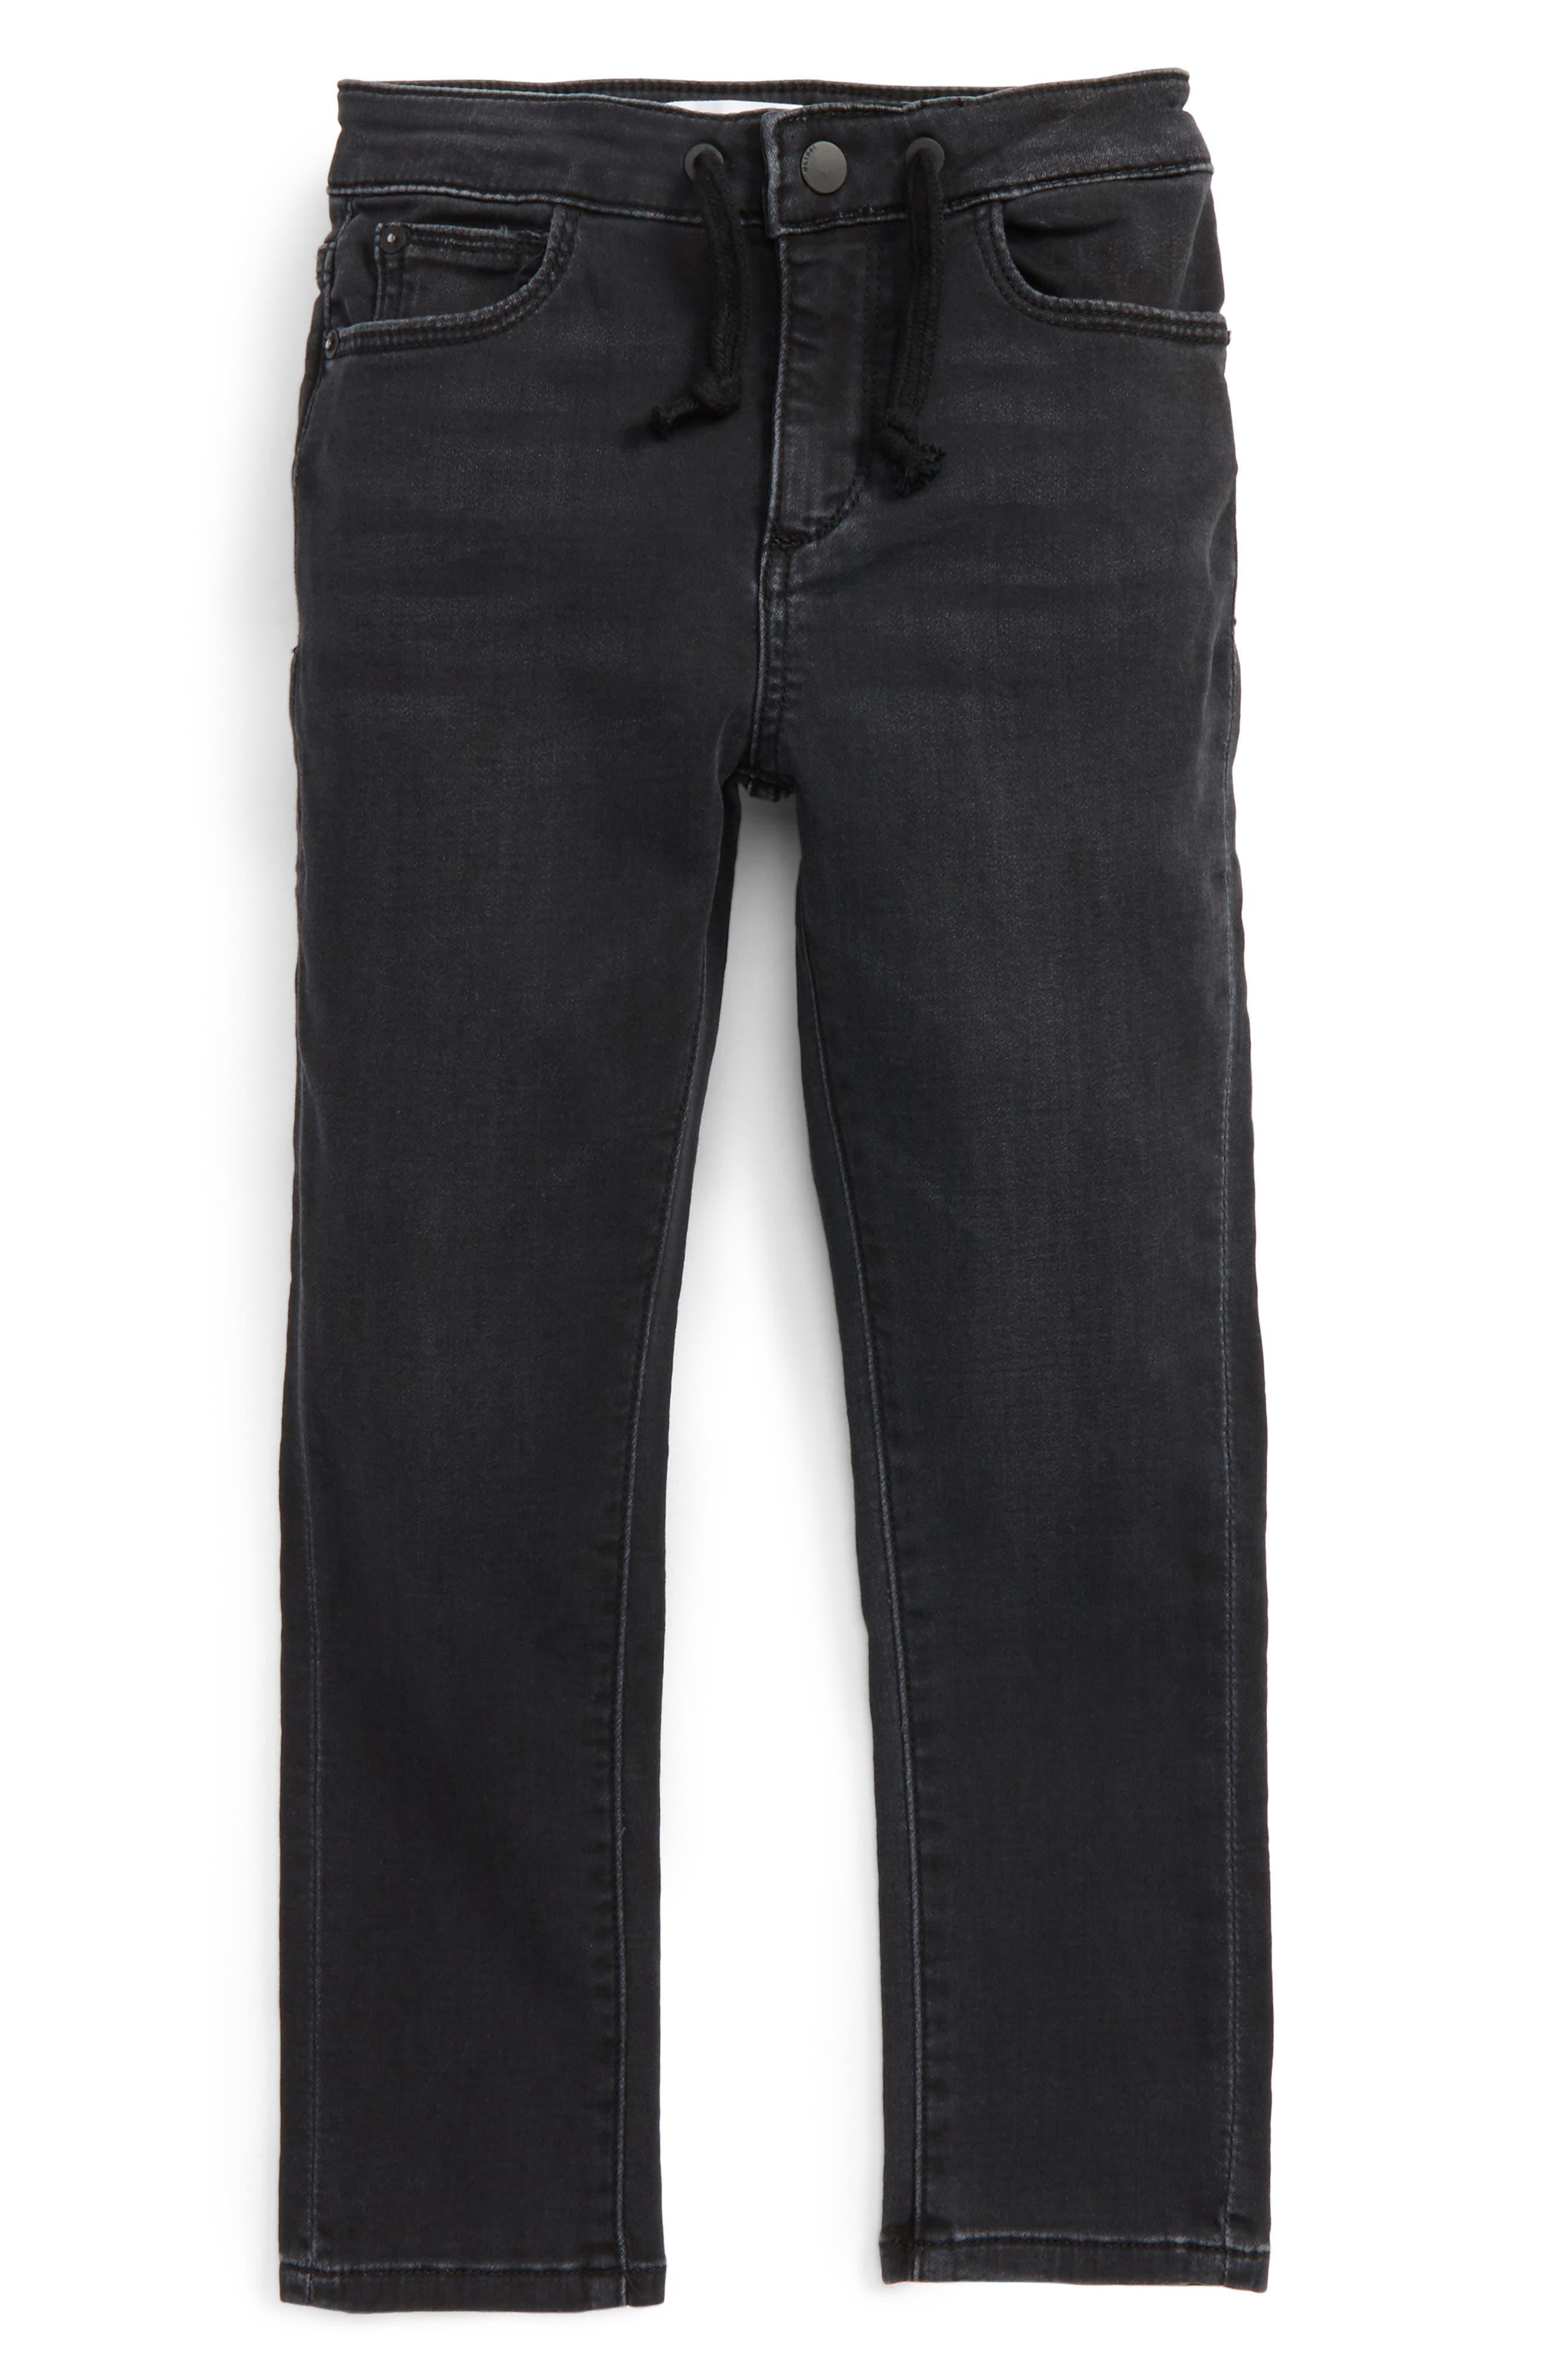 DL1961 William Active X Stonewash Knit Denim Jogger Pants (Toddler Boys & Little Boys)